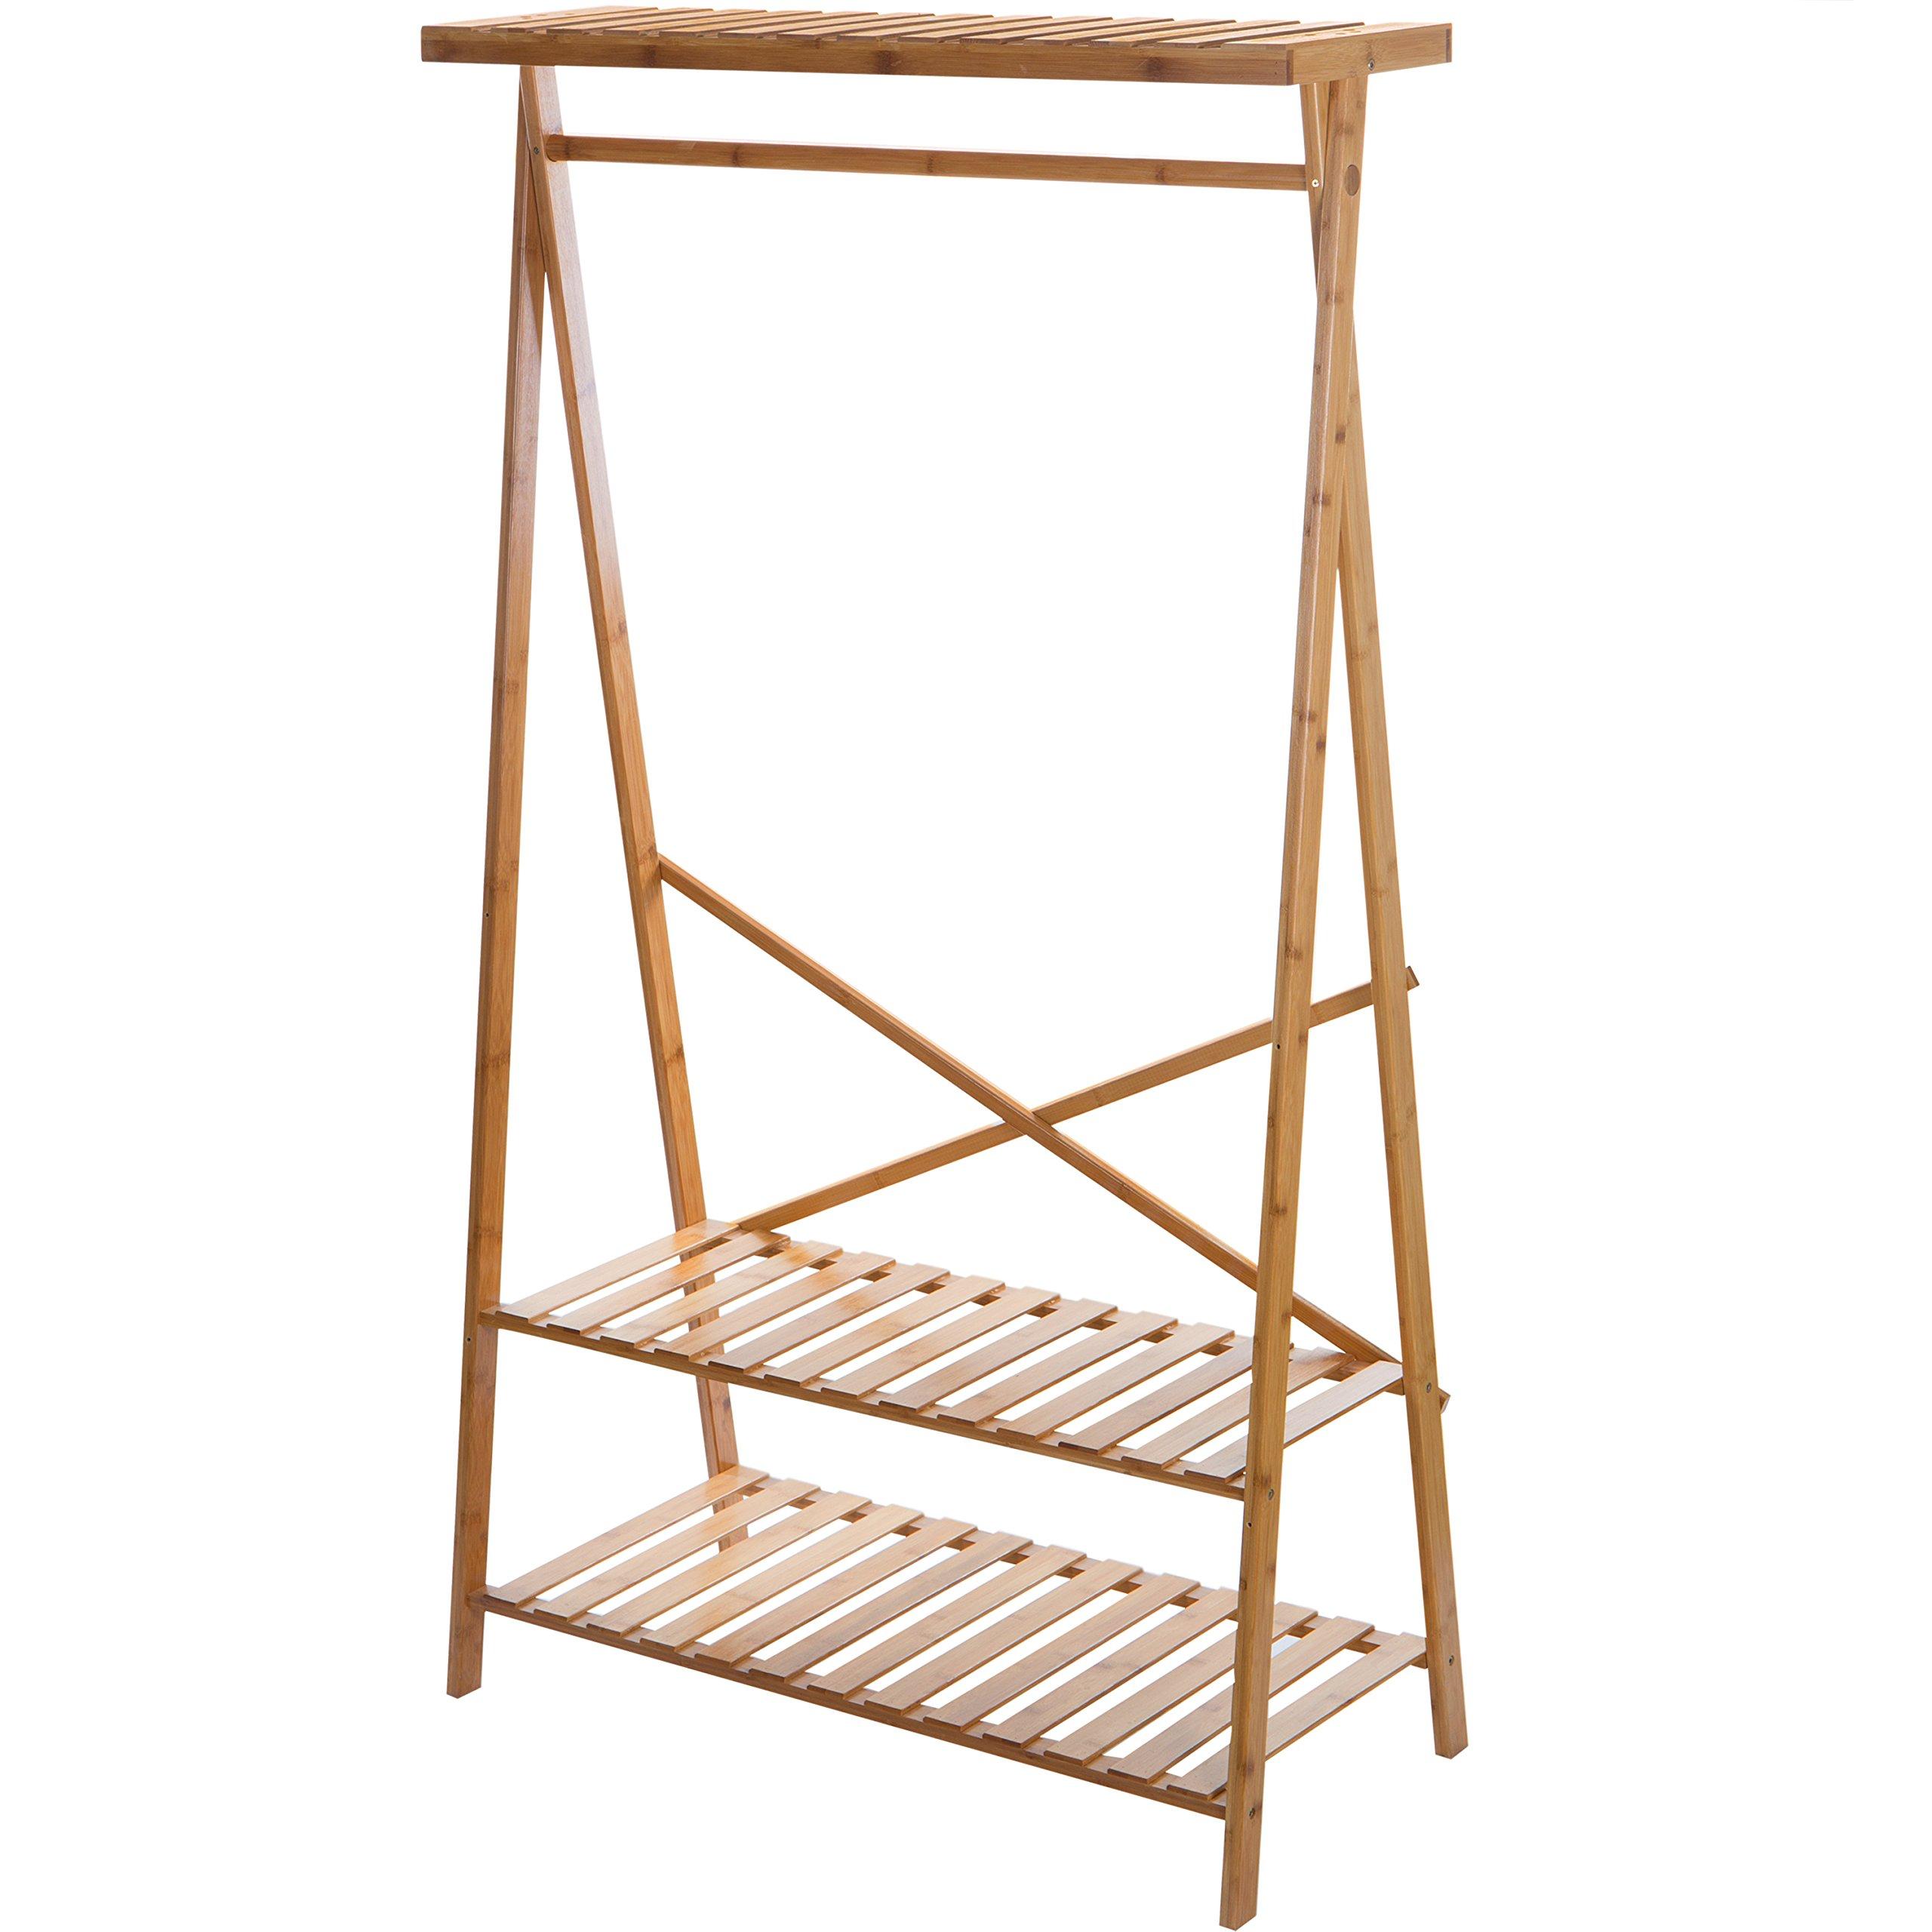 MyGift Natural Wood Freestanding Garment Rack with Shelves